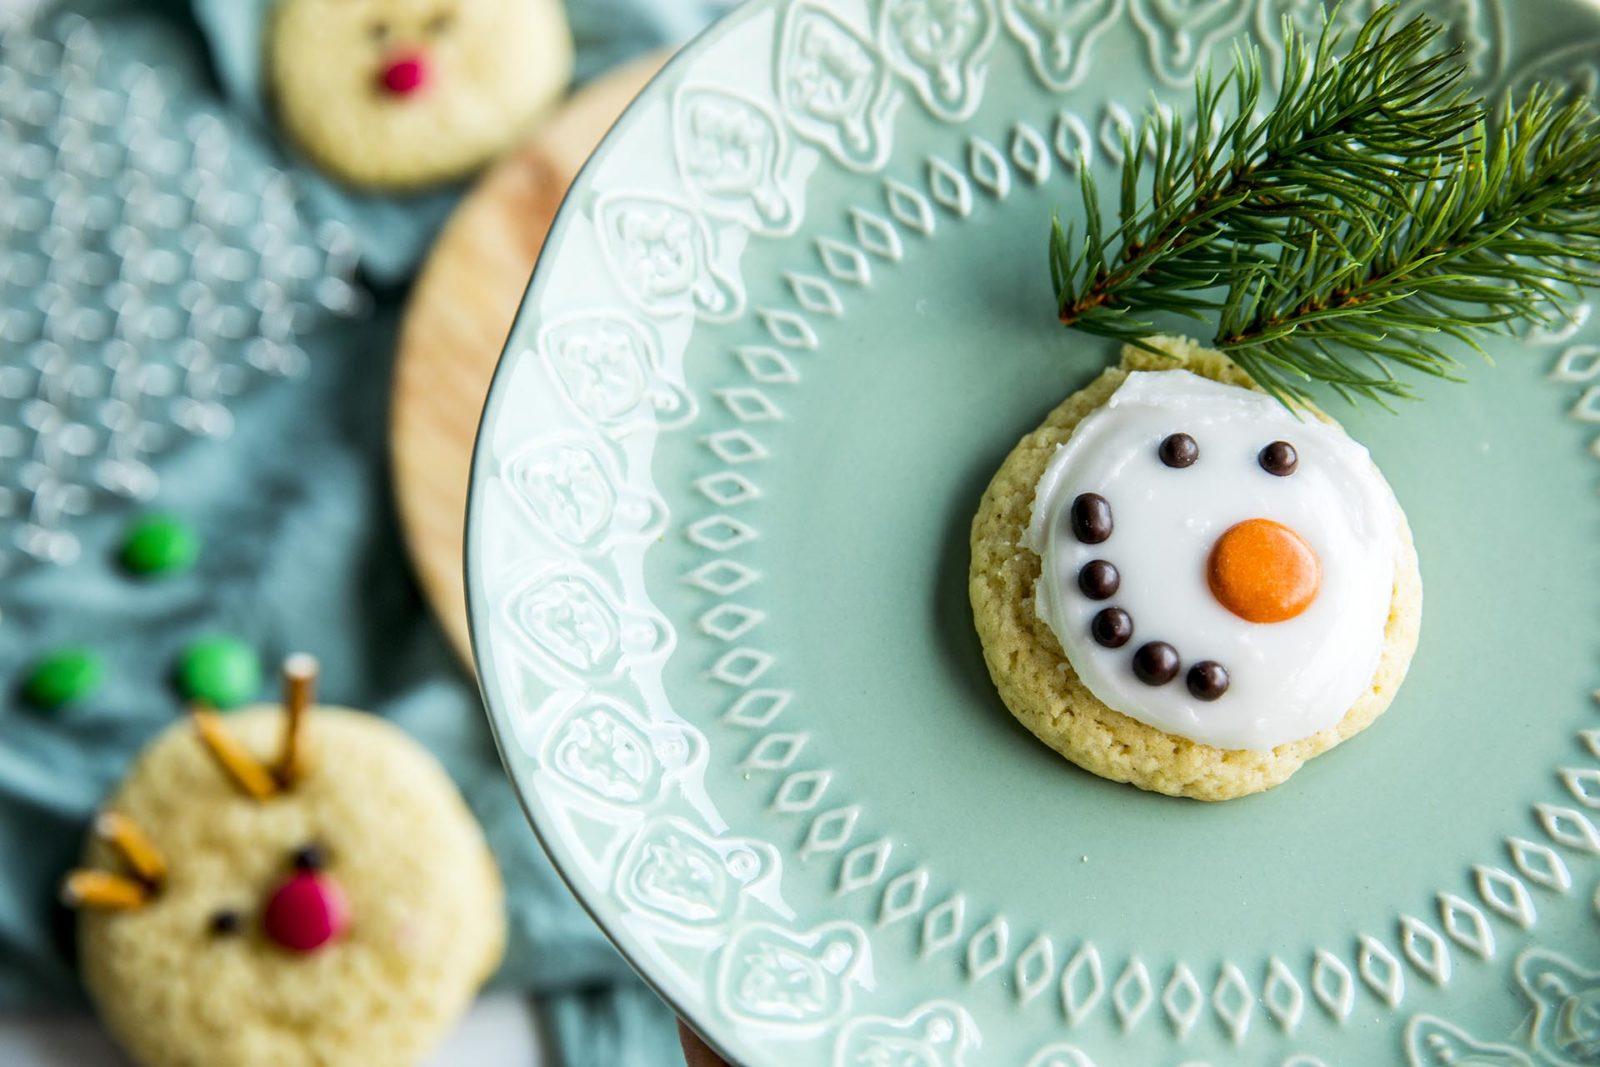 Barnas julekjeks pyntet som Olaf